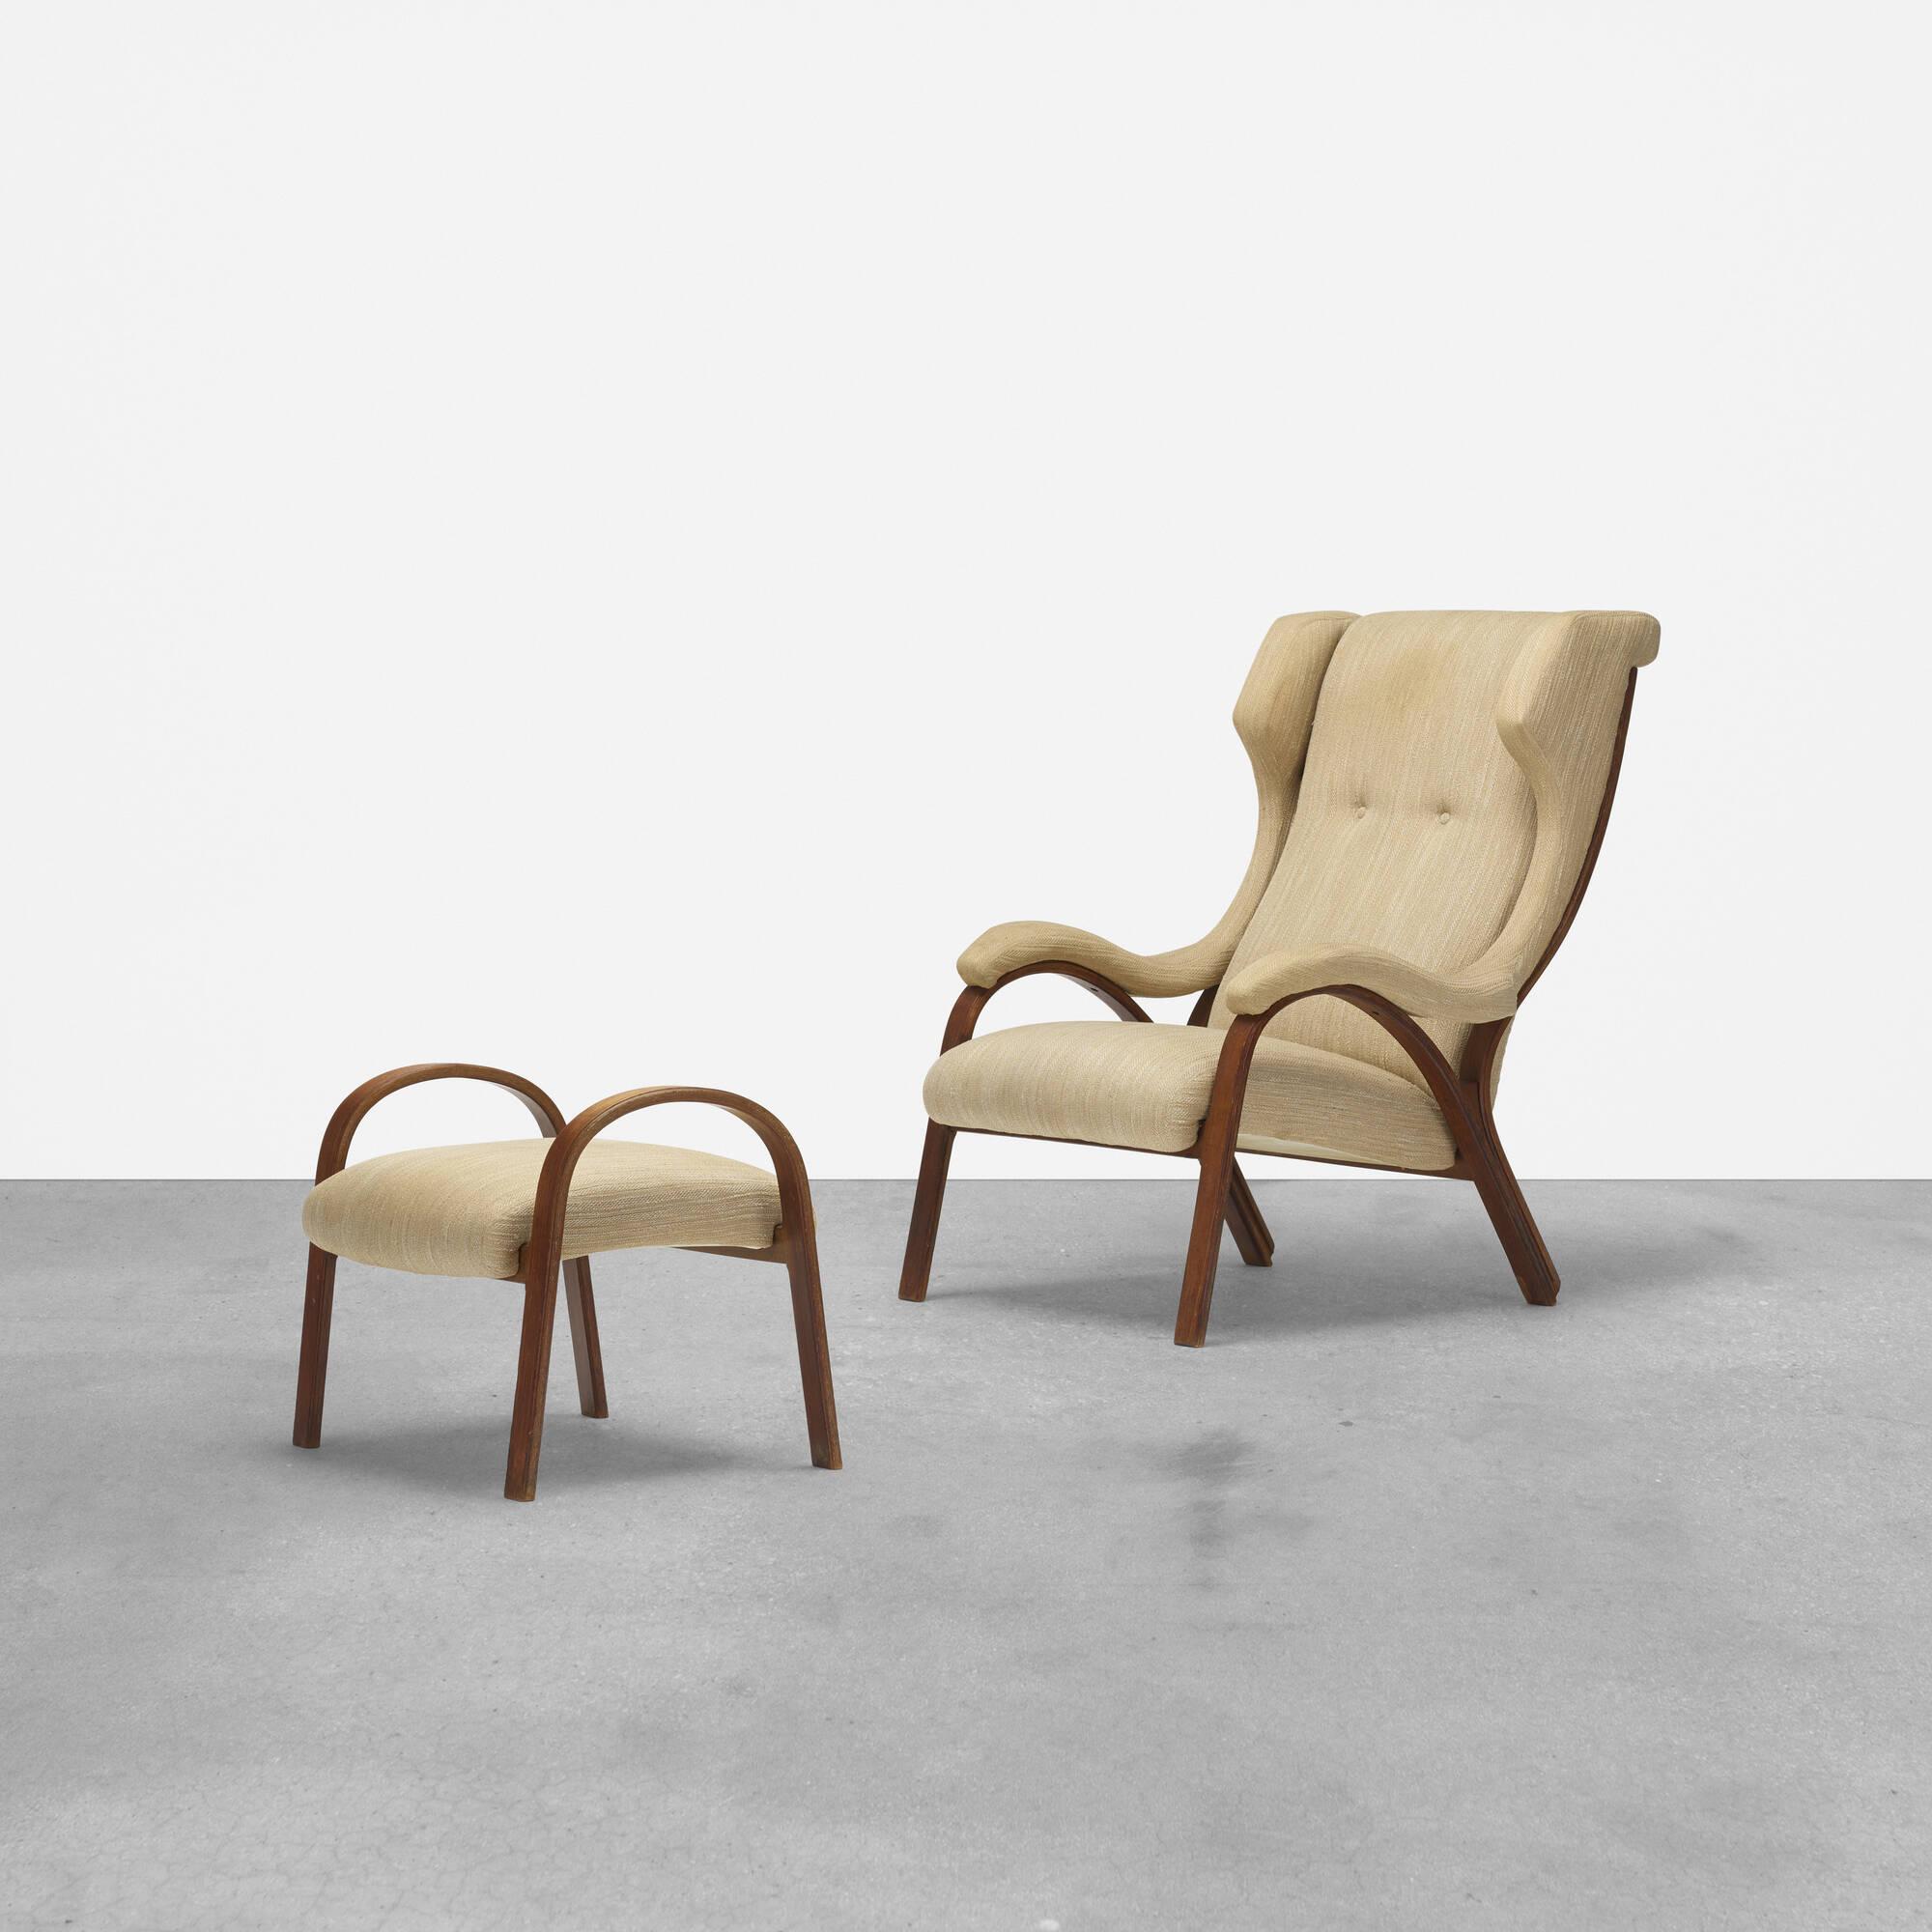 204: Vittorio Gregotti, Lodovico Meneghetti and Giotto Stoppino / prototype Cavour lounge chair and ottoman (1 of 3)